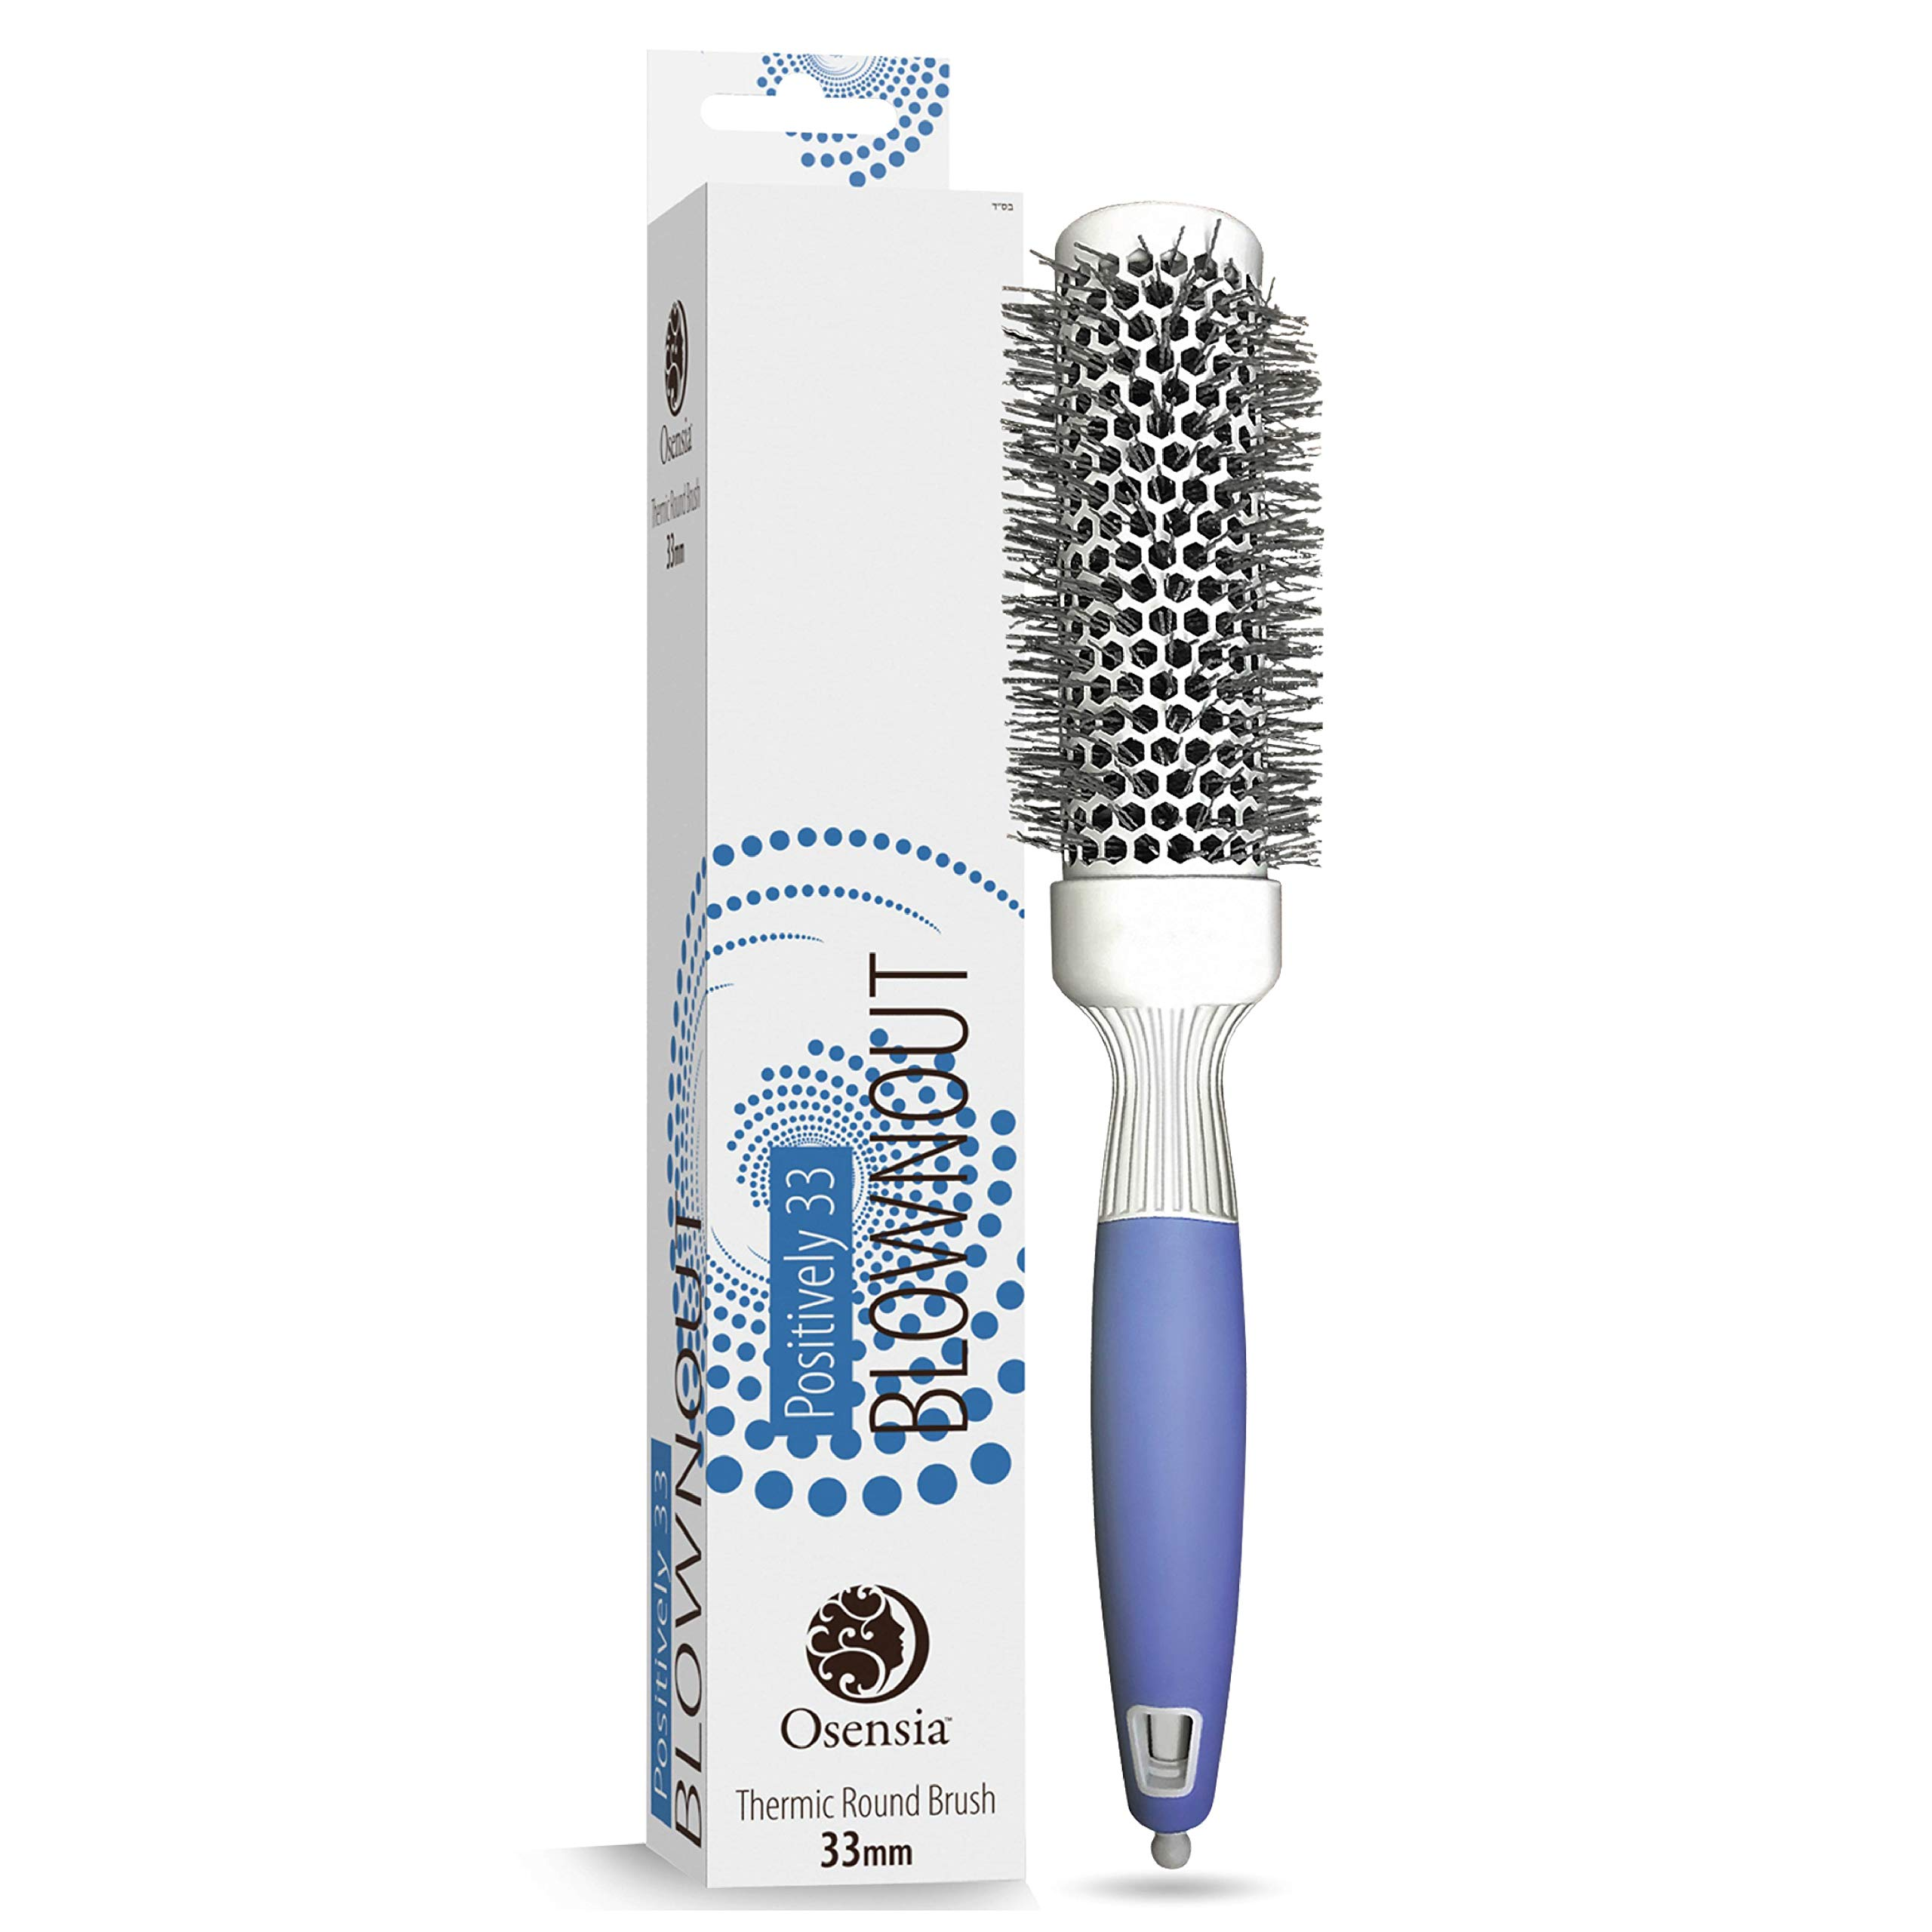 Professional Round Brush Blow Drying